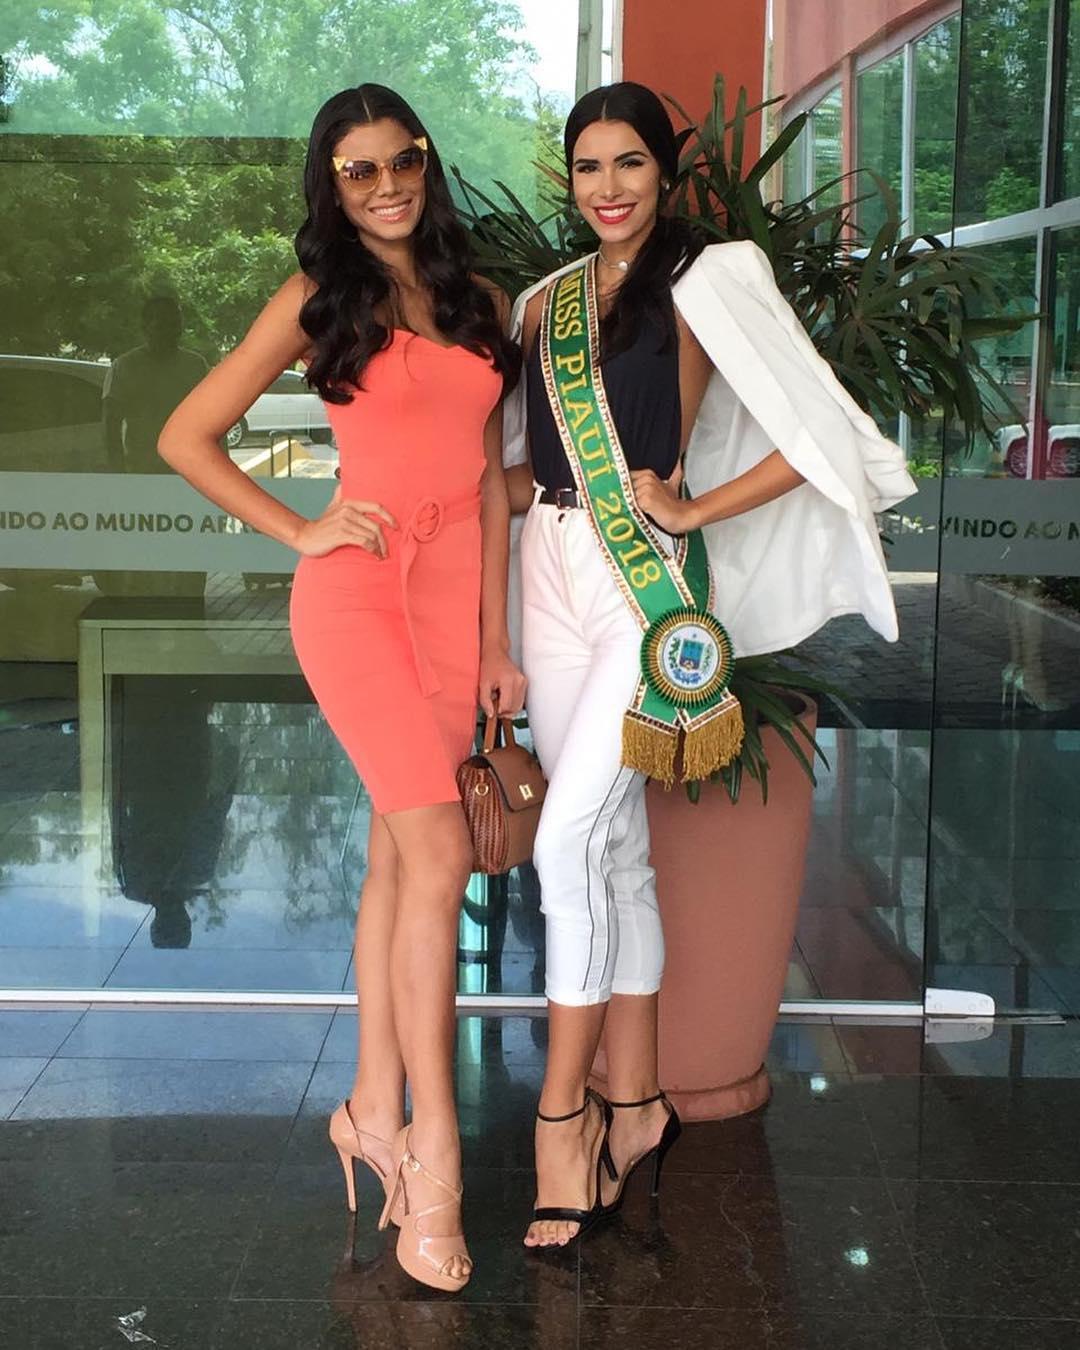 dagmara landim, top 10 de miss brasil universo 2019. - Página 2 52590710